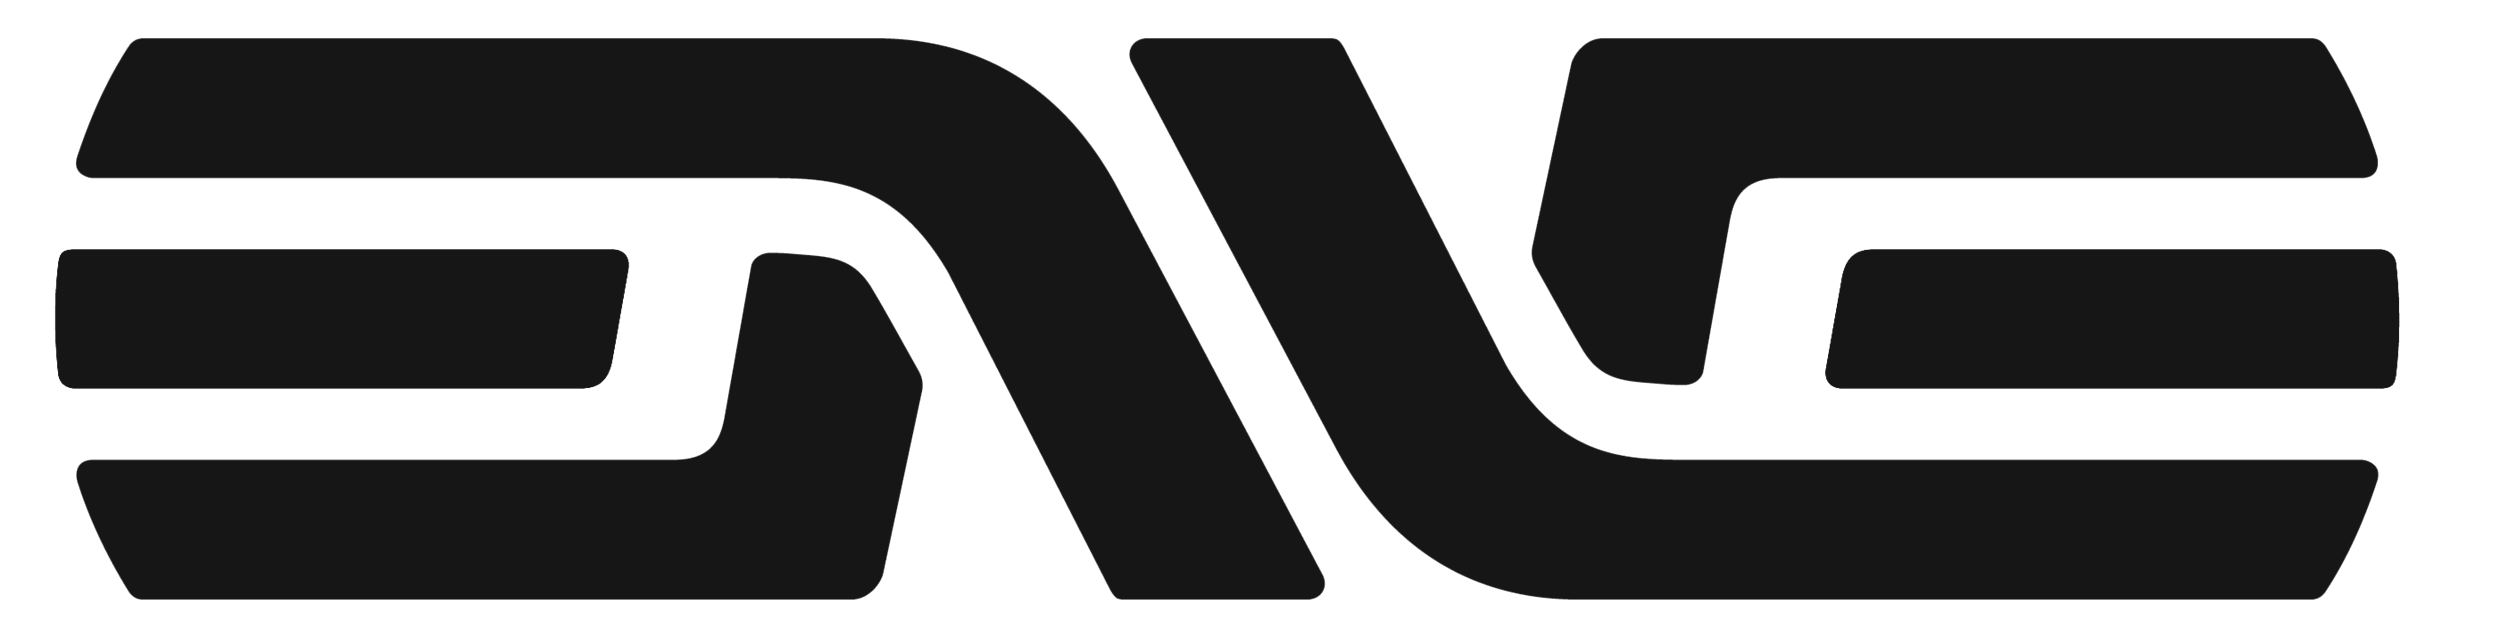 Enve_Logo.png